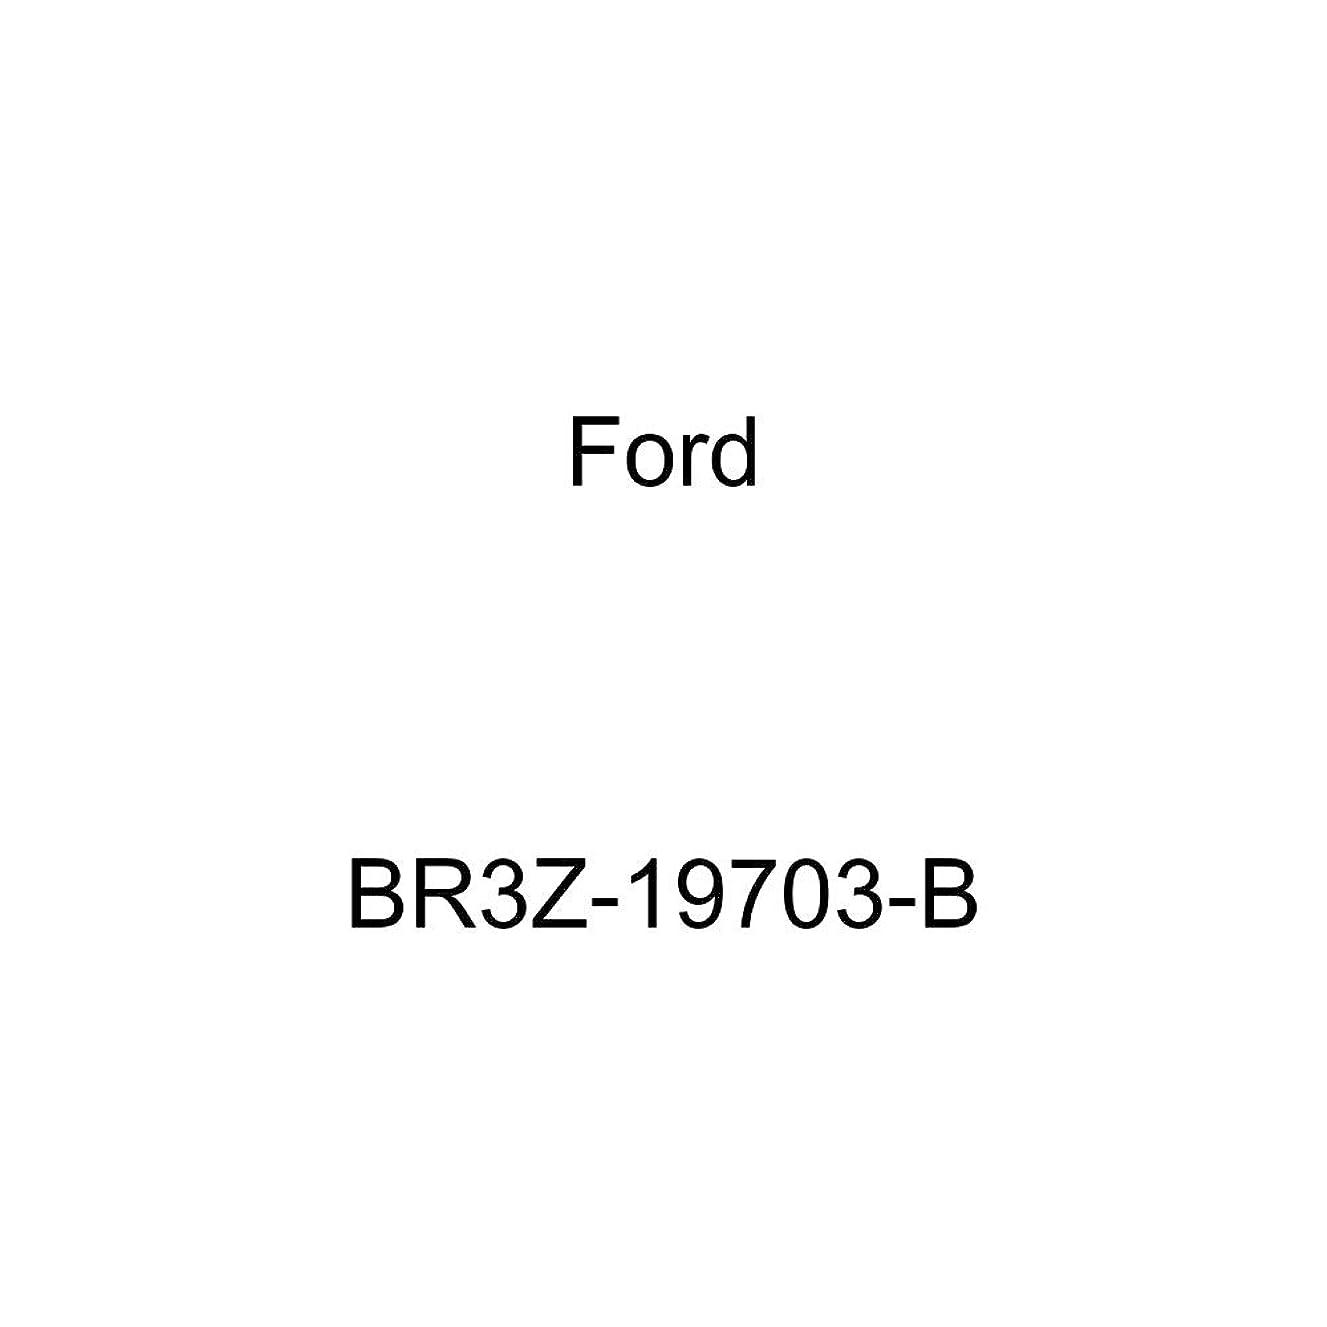 Ford BR3Z-19703-B Compressor Assembly